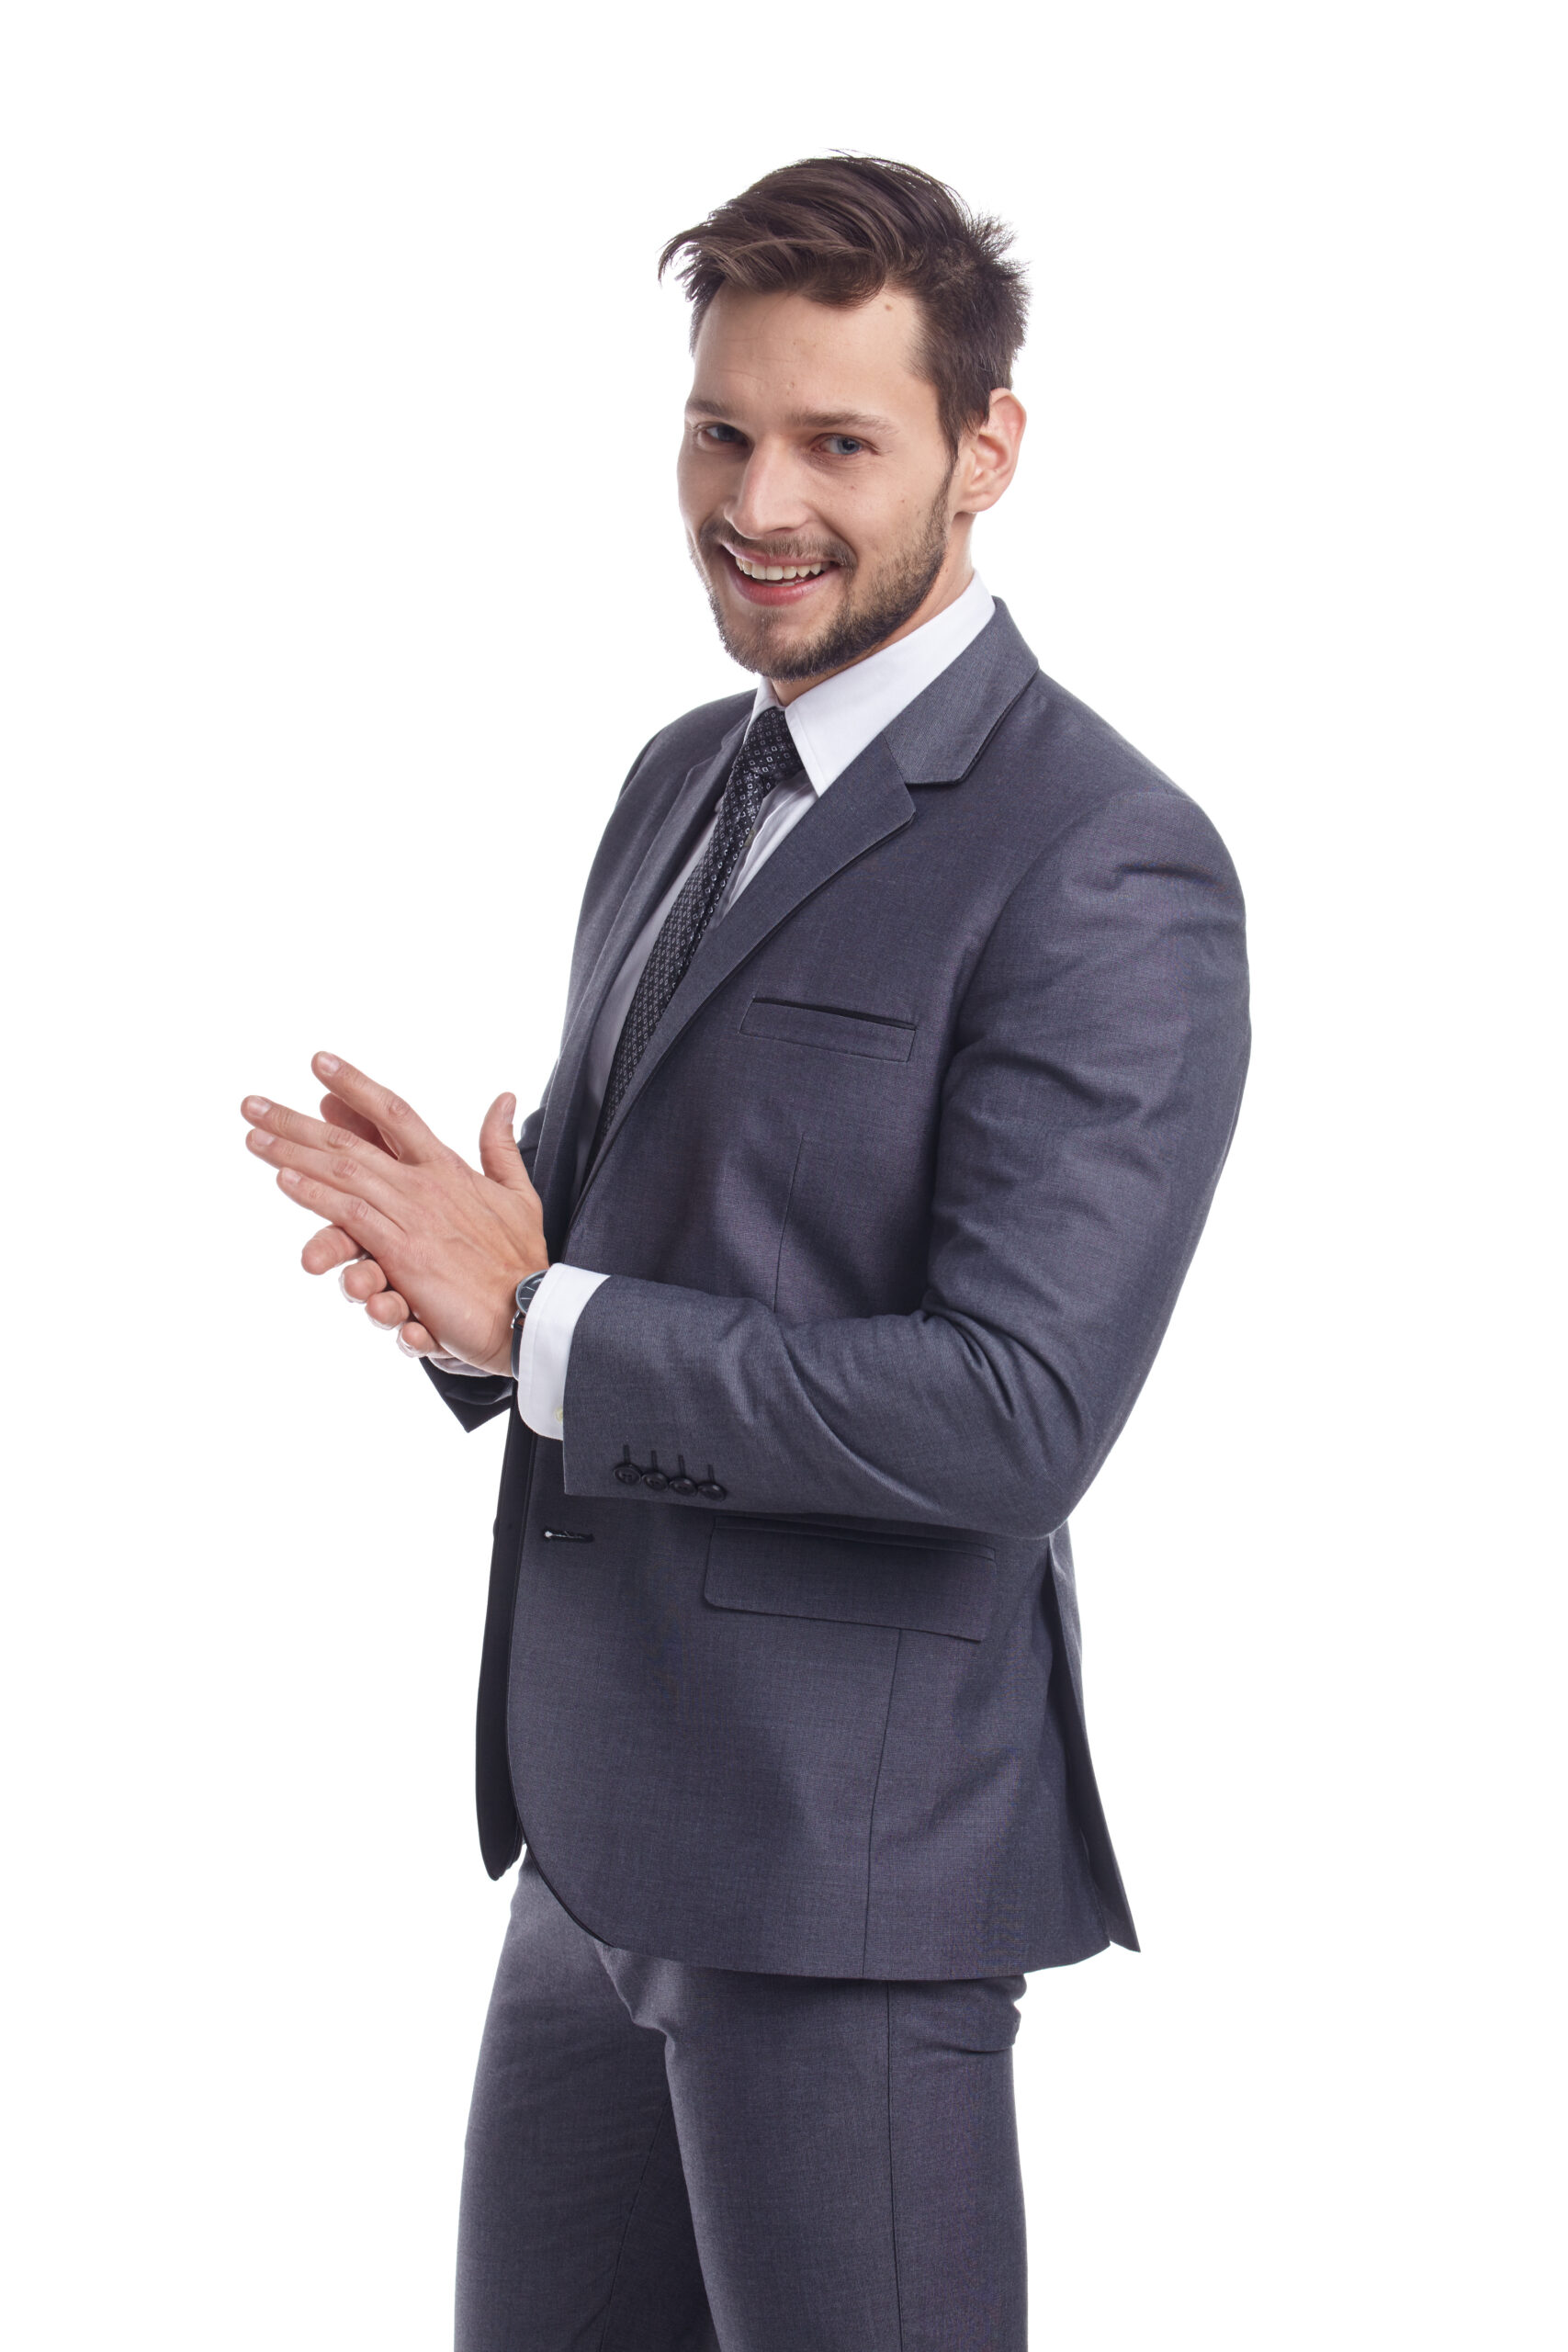 turbo tax premier image of businessman